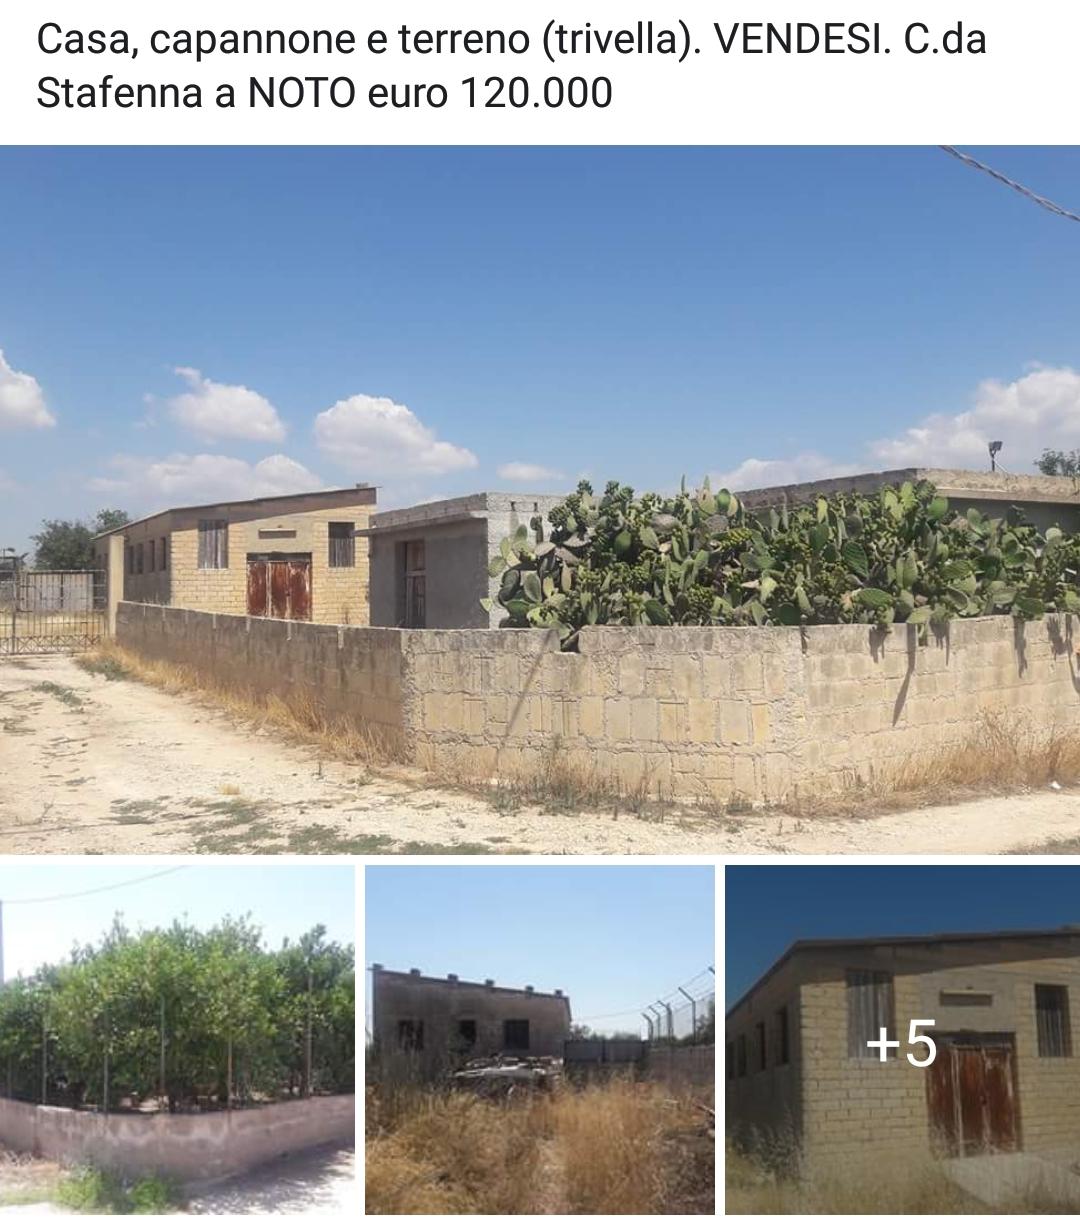 Casa con terreno a NOTO